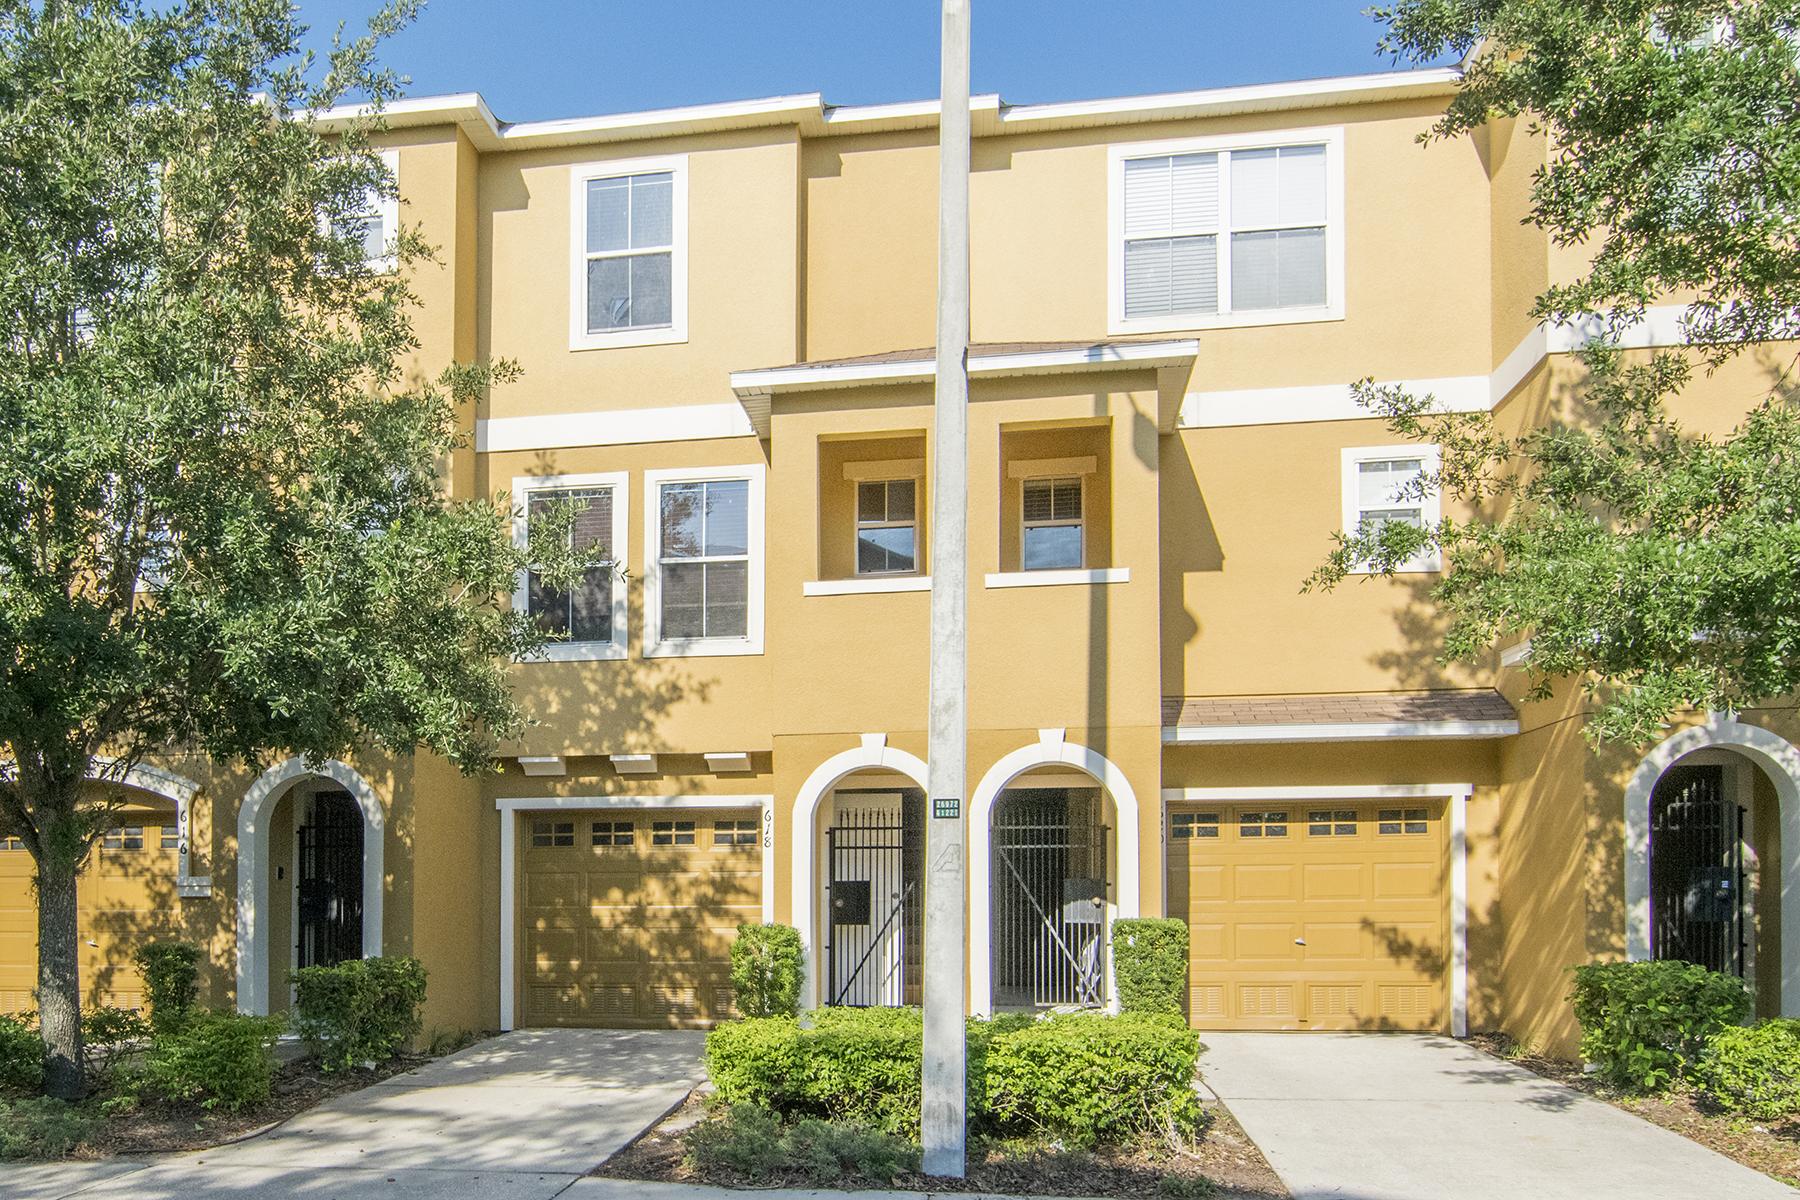 Residência urbana para Venda às TAMPA 618 Wheaton Trent Pl Tampa, Florida, 33619 Estados Unidos